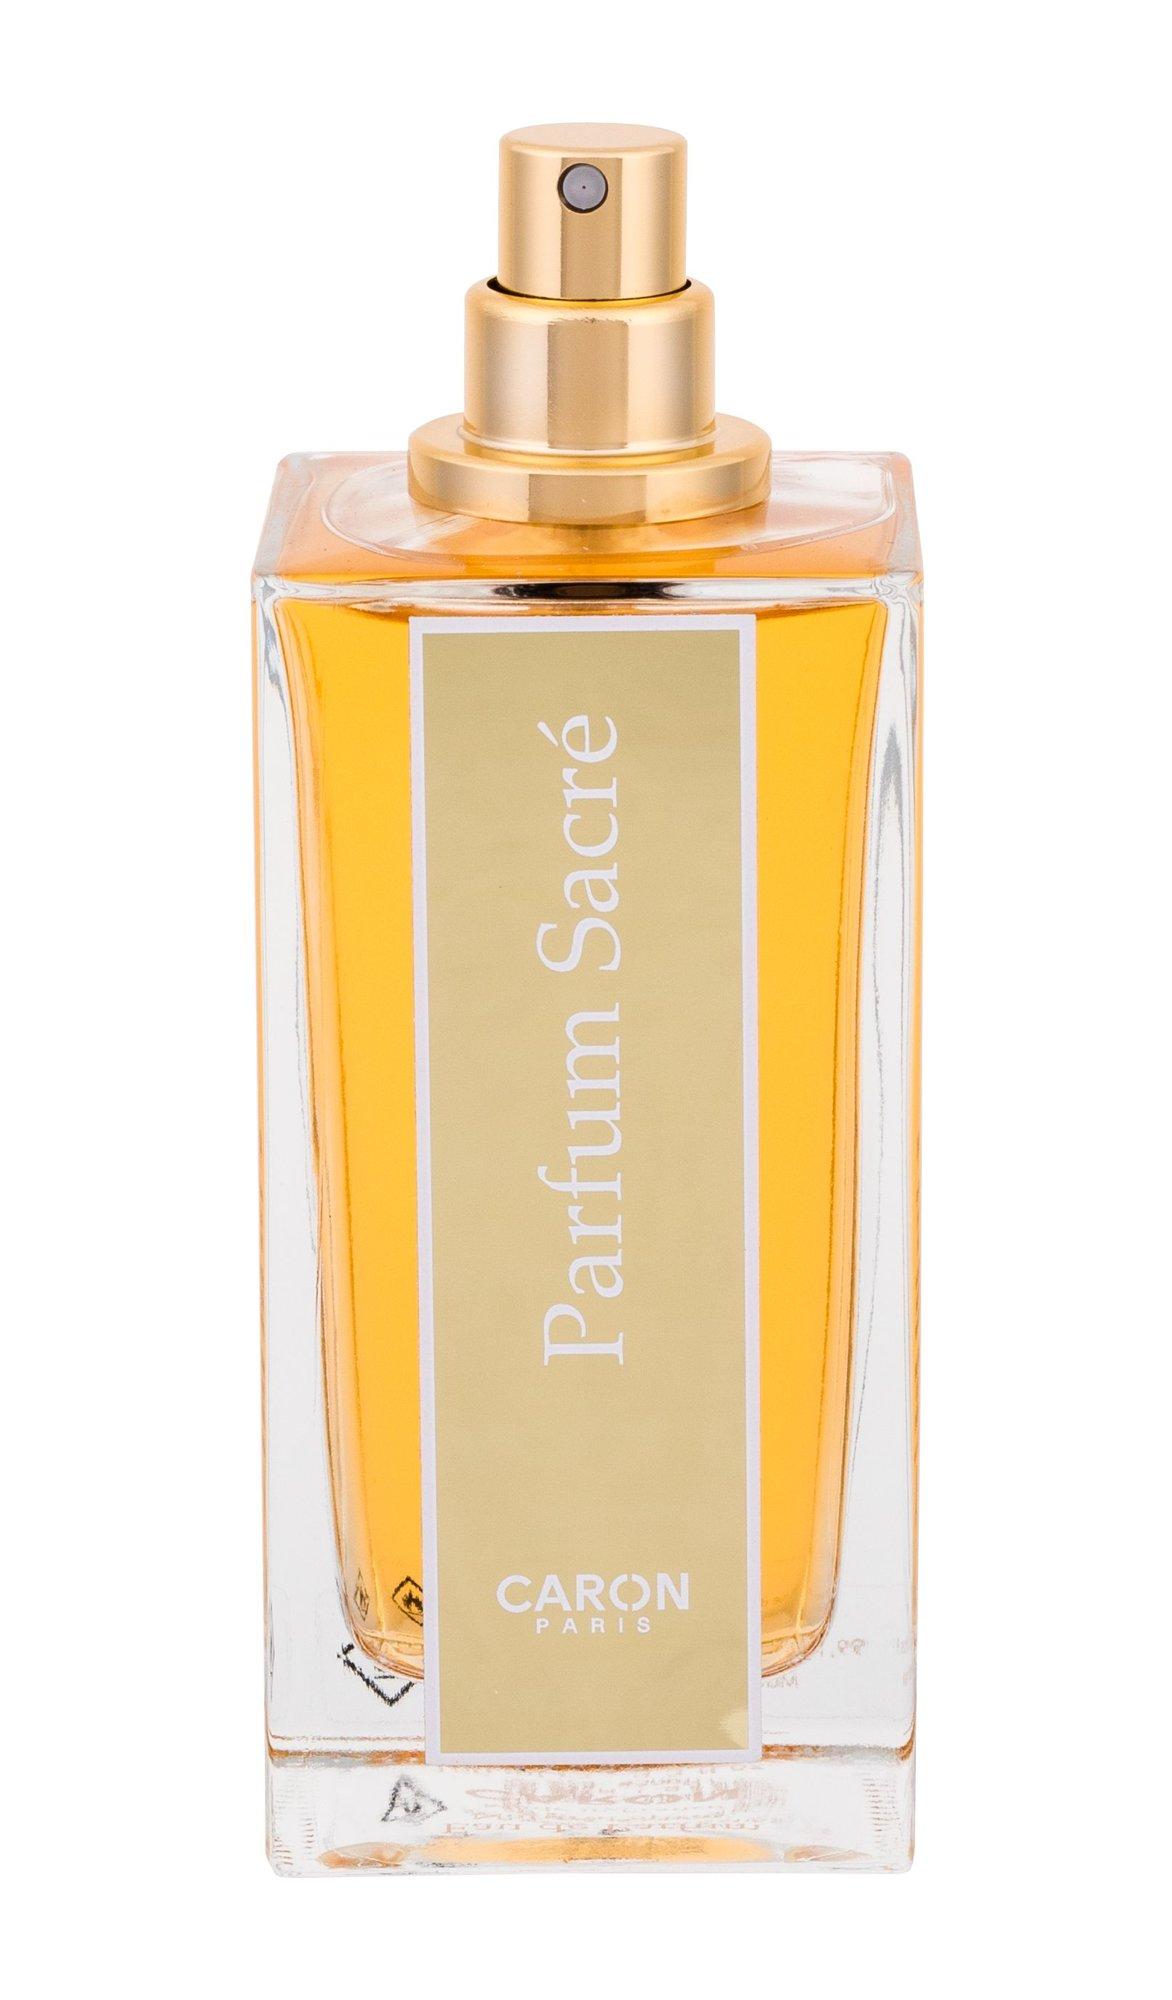 Caron La Selection Parfum Sacre EDP 100ml